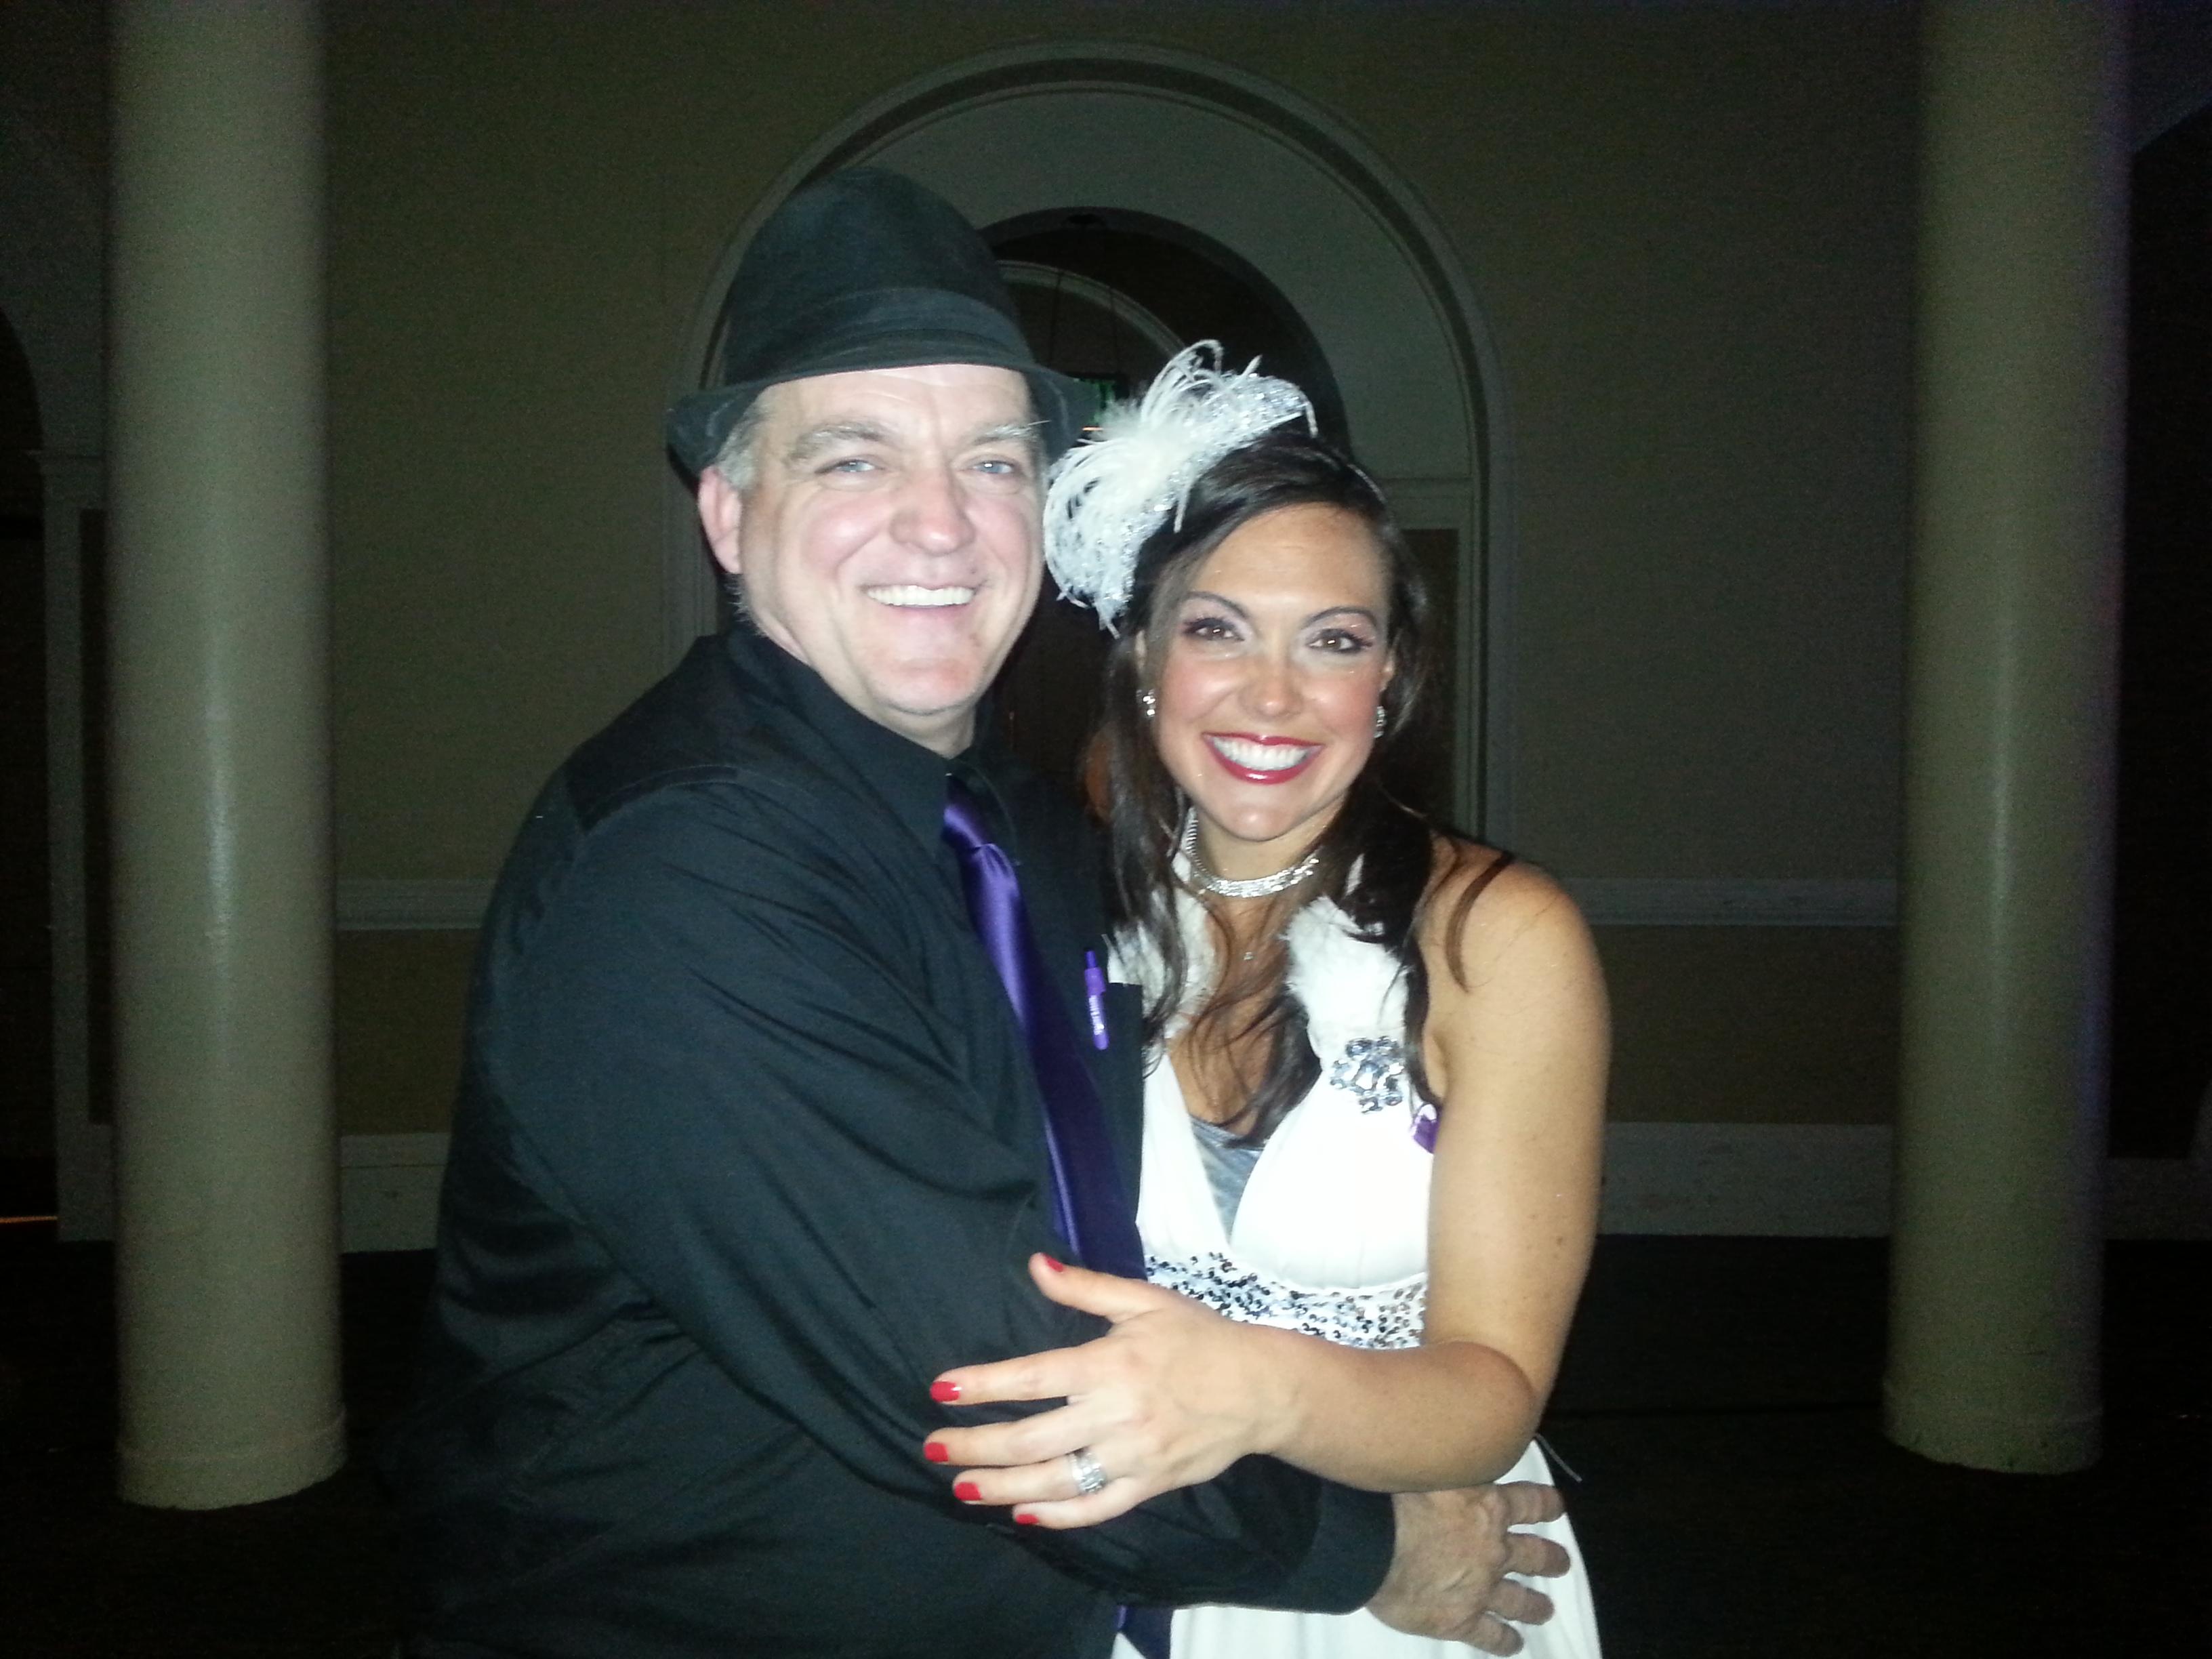 Daniel with Courtney Swift, 2012 Judges' Choice winner